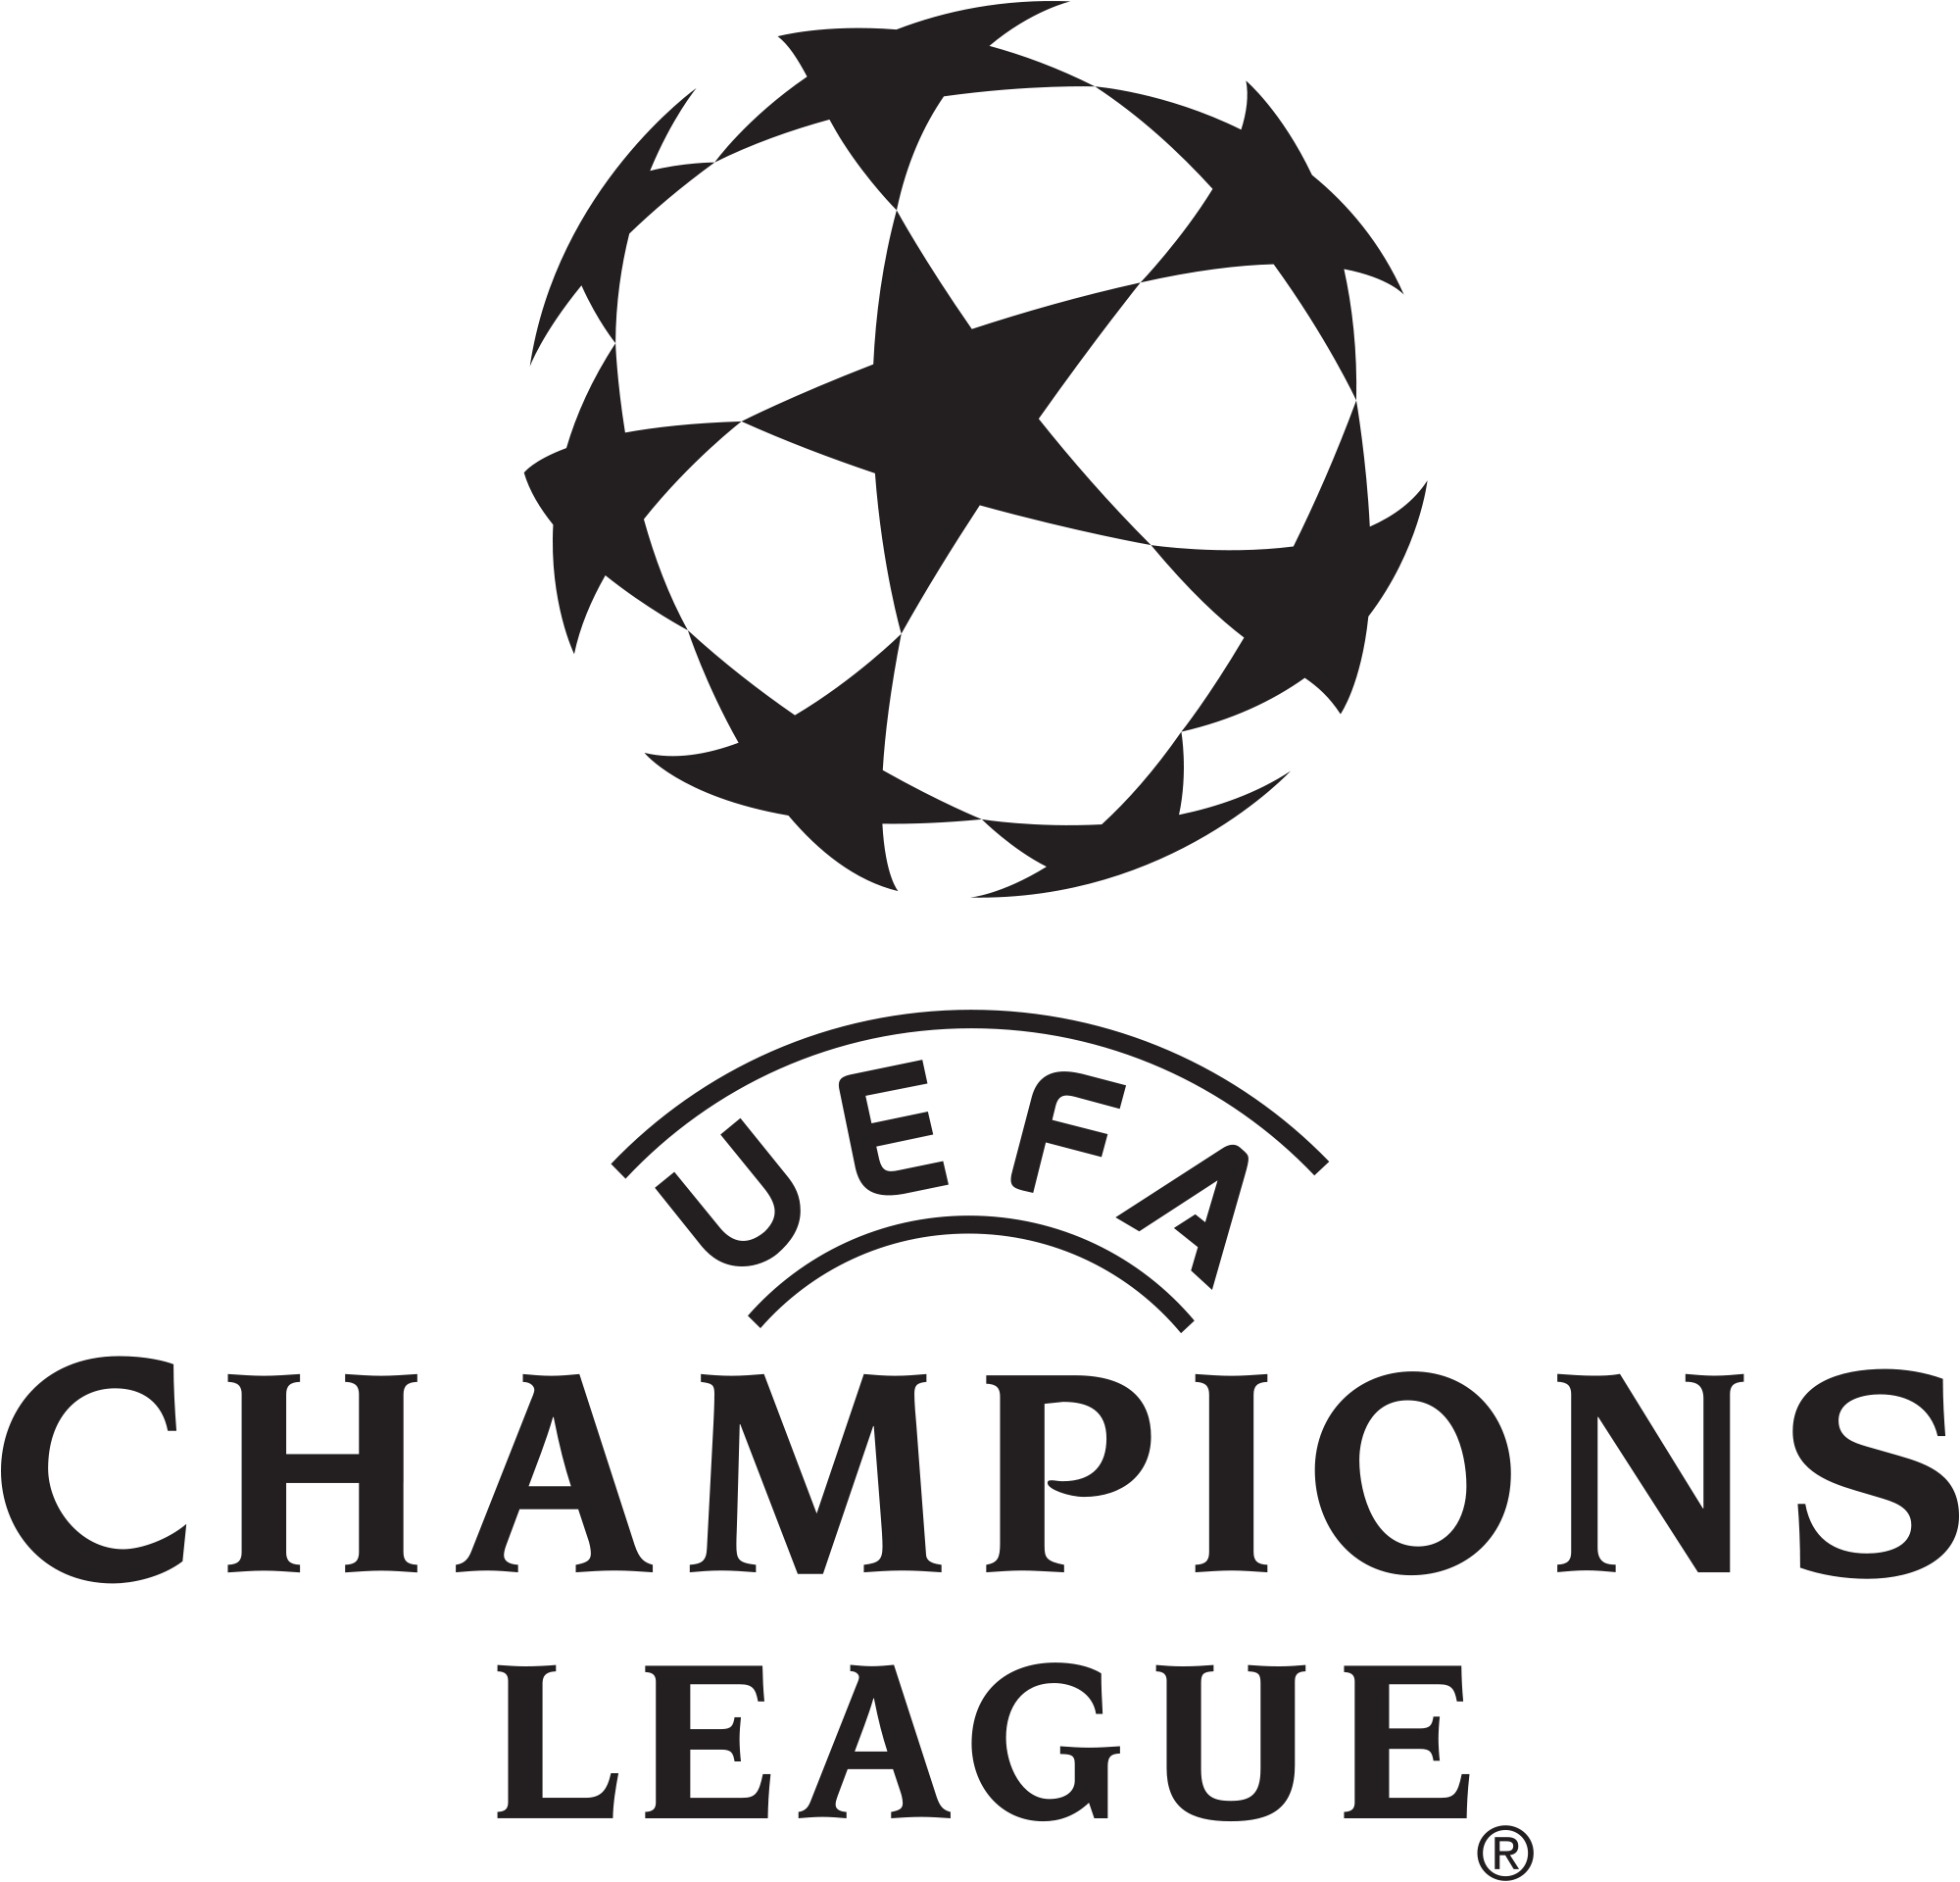 Uefa Champions League Logo Wallpaper High Definition Champions League Draw Champions League Logo Uefa Champions League